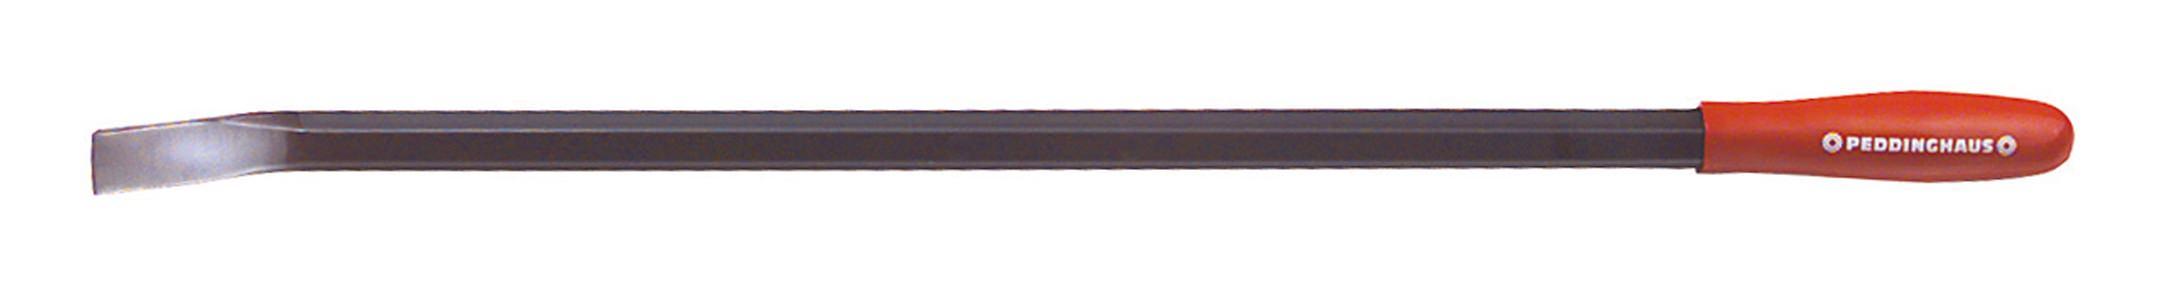 Peddingshaus Peddinghaus Hebeleisen 800mm mit Griff - 0200010800